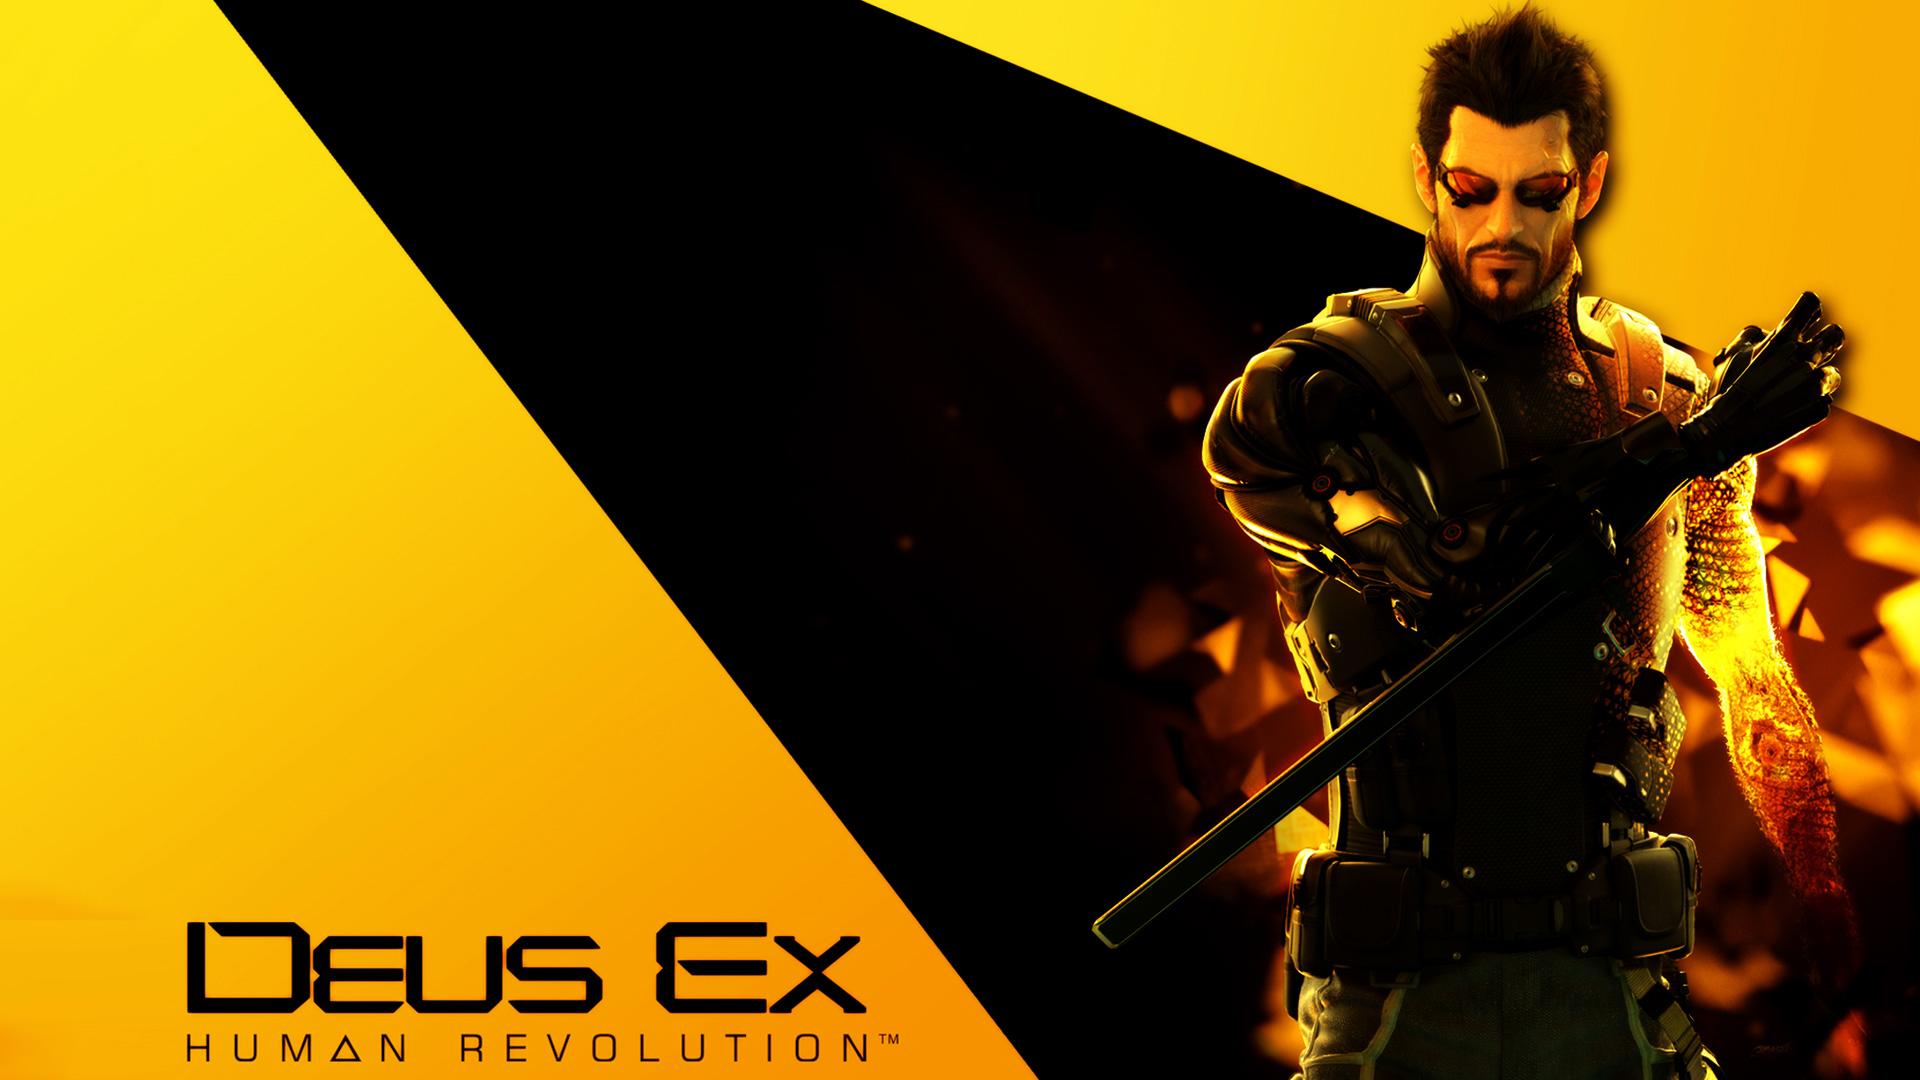 Deus Ex: Human Revolution Wallpaper in 1920x1080